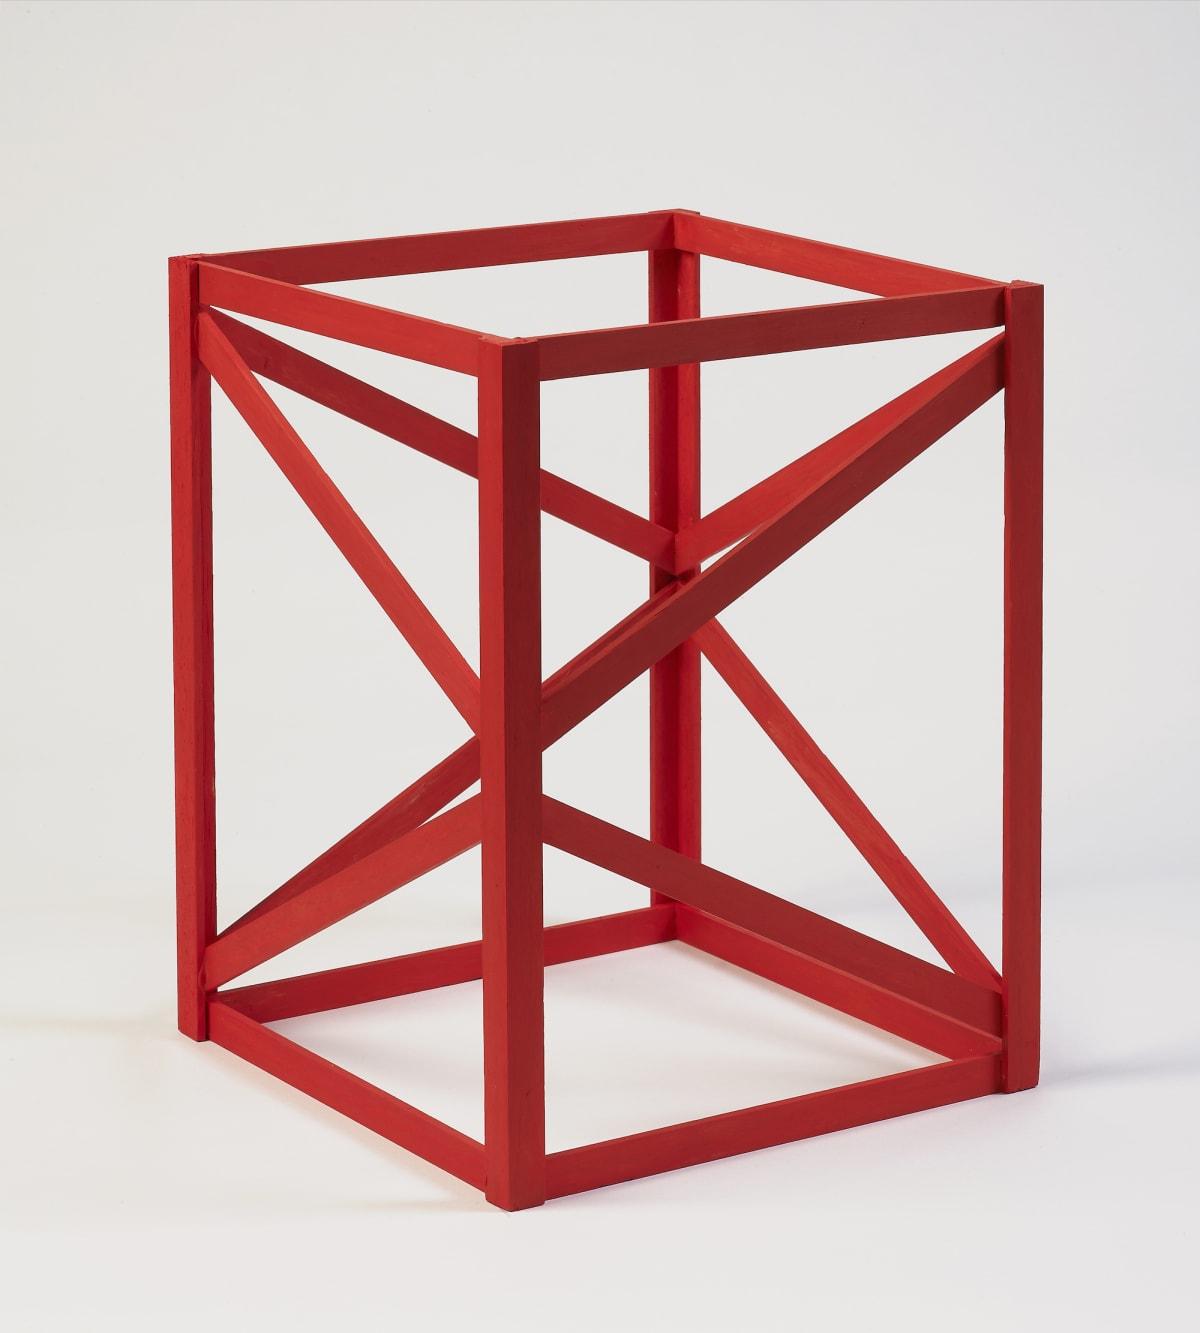 Rasheed Araeen b. 1935Multi-Red, 1968-2018 Acrylic on wood 30 x 23 x 23 cm 11 3/4 x 9 1/8 x 9 1/8 in Edition of 50